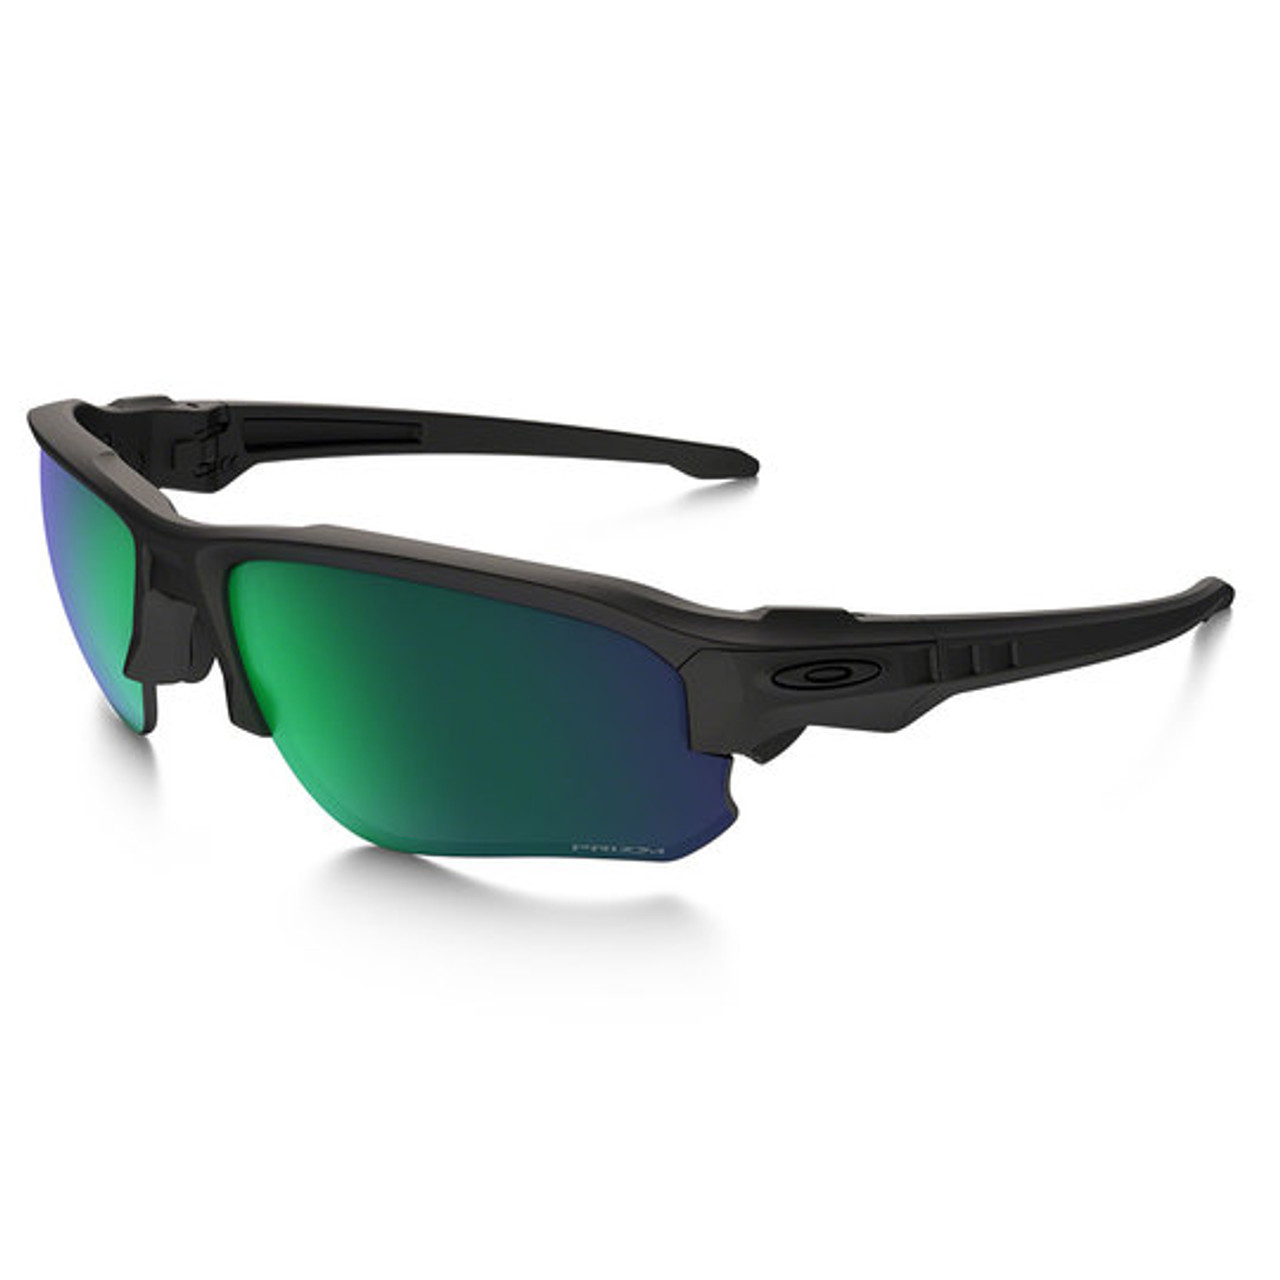 bcecf6c4d9c Oakley - Eyewear - SI Speed Jacket (Matte Black Frame w  Prizm Maritime  Polarized Lens) - Amped Airsoft